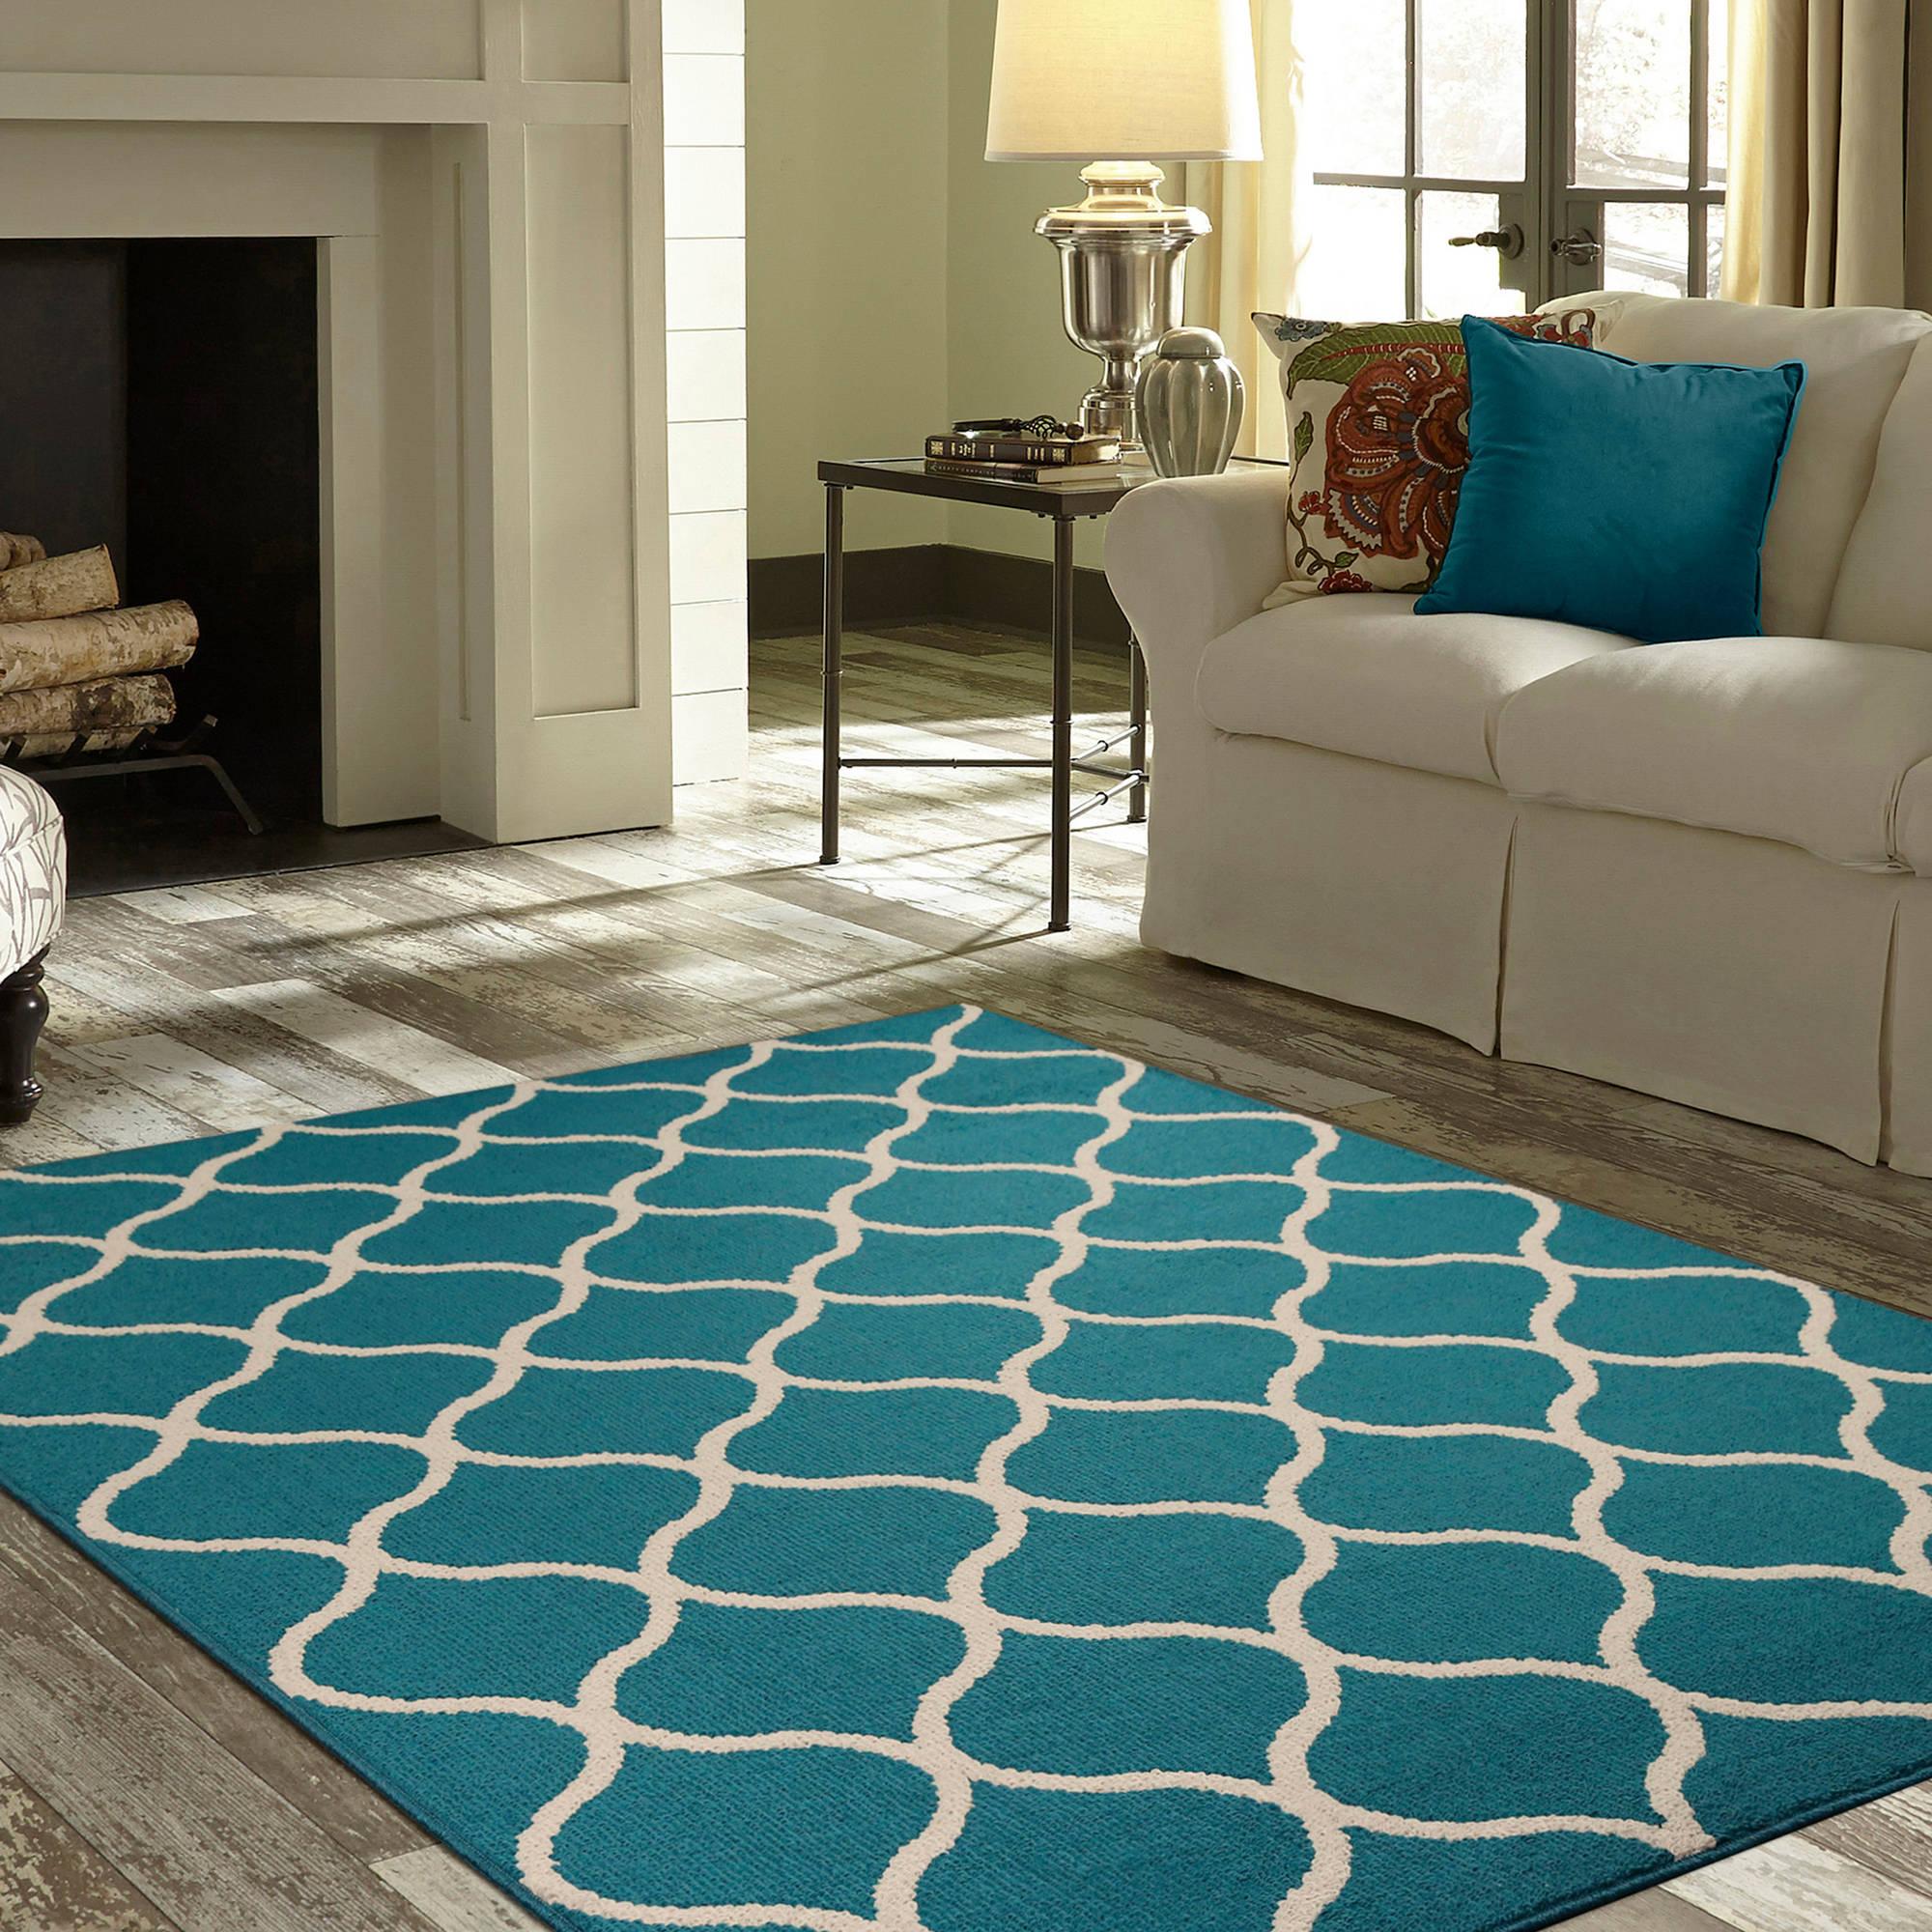 teal rugs mainstays sheridan area rug or runner TOUJMGP